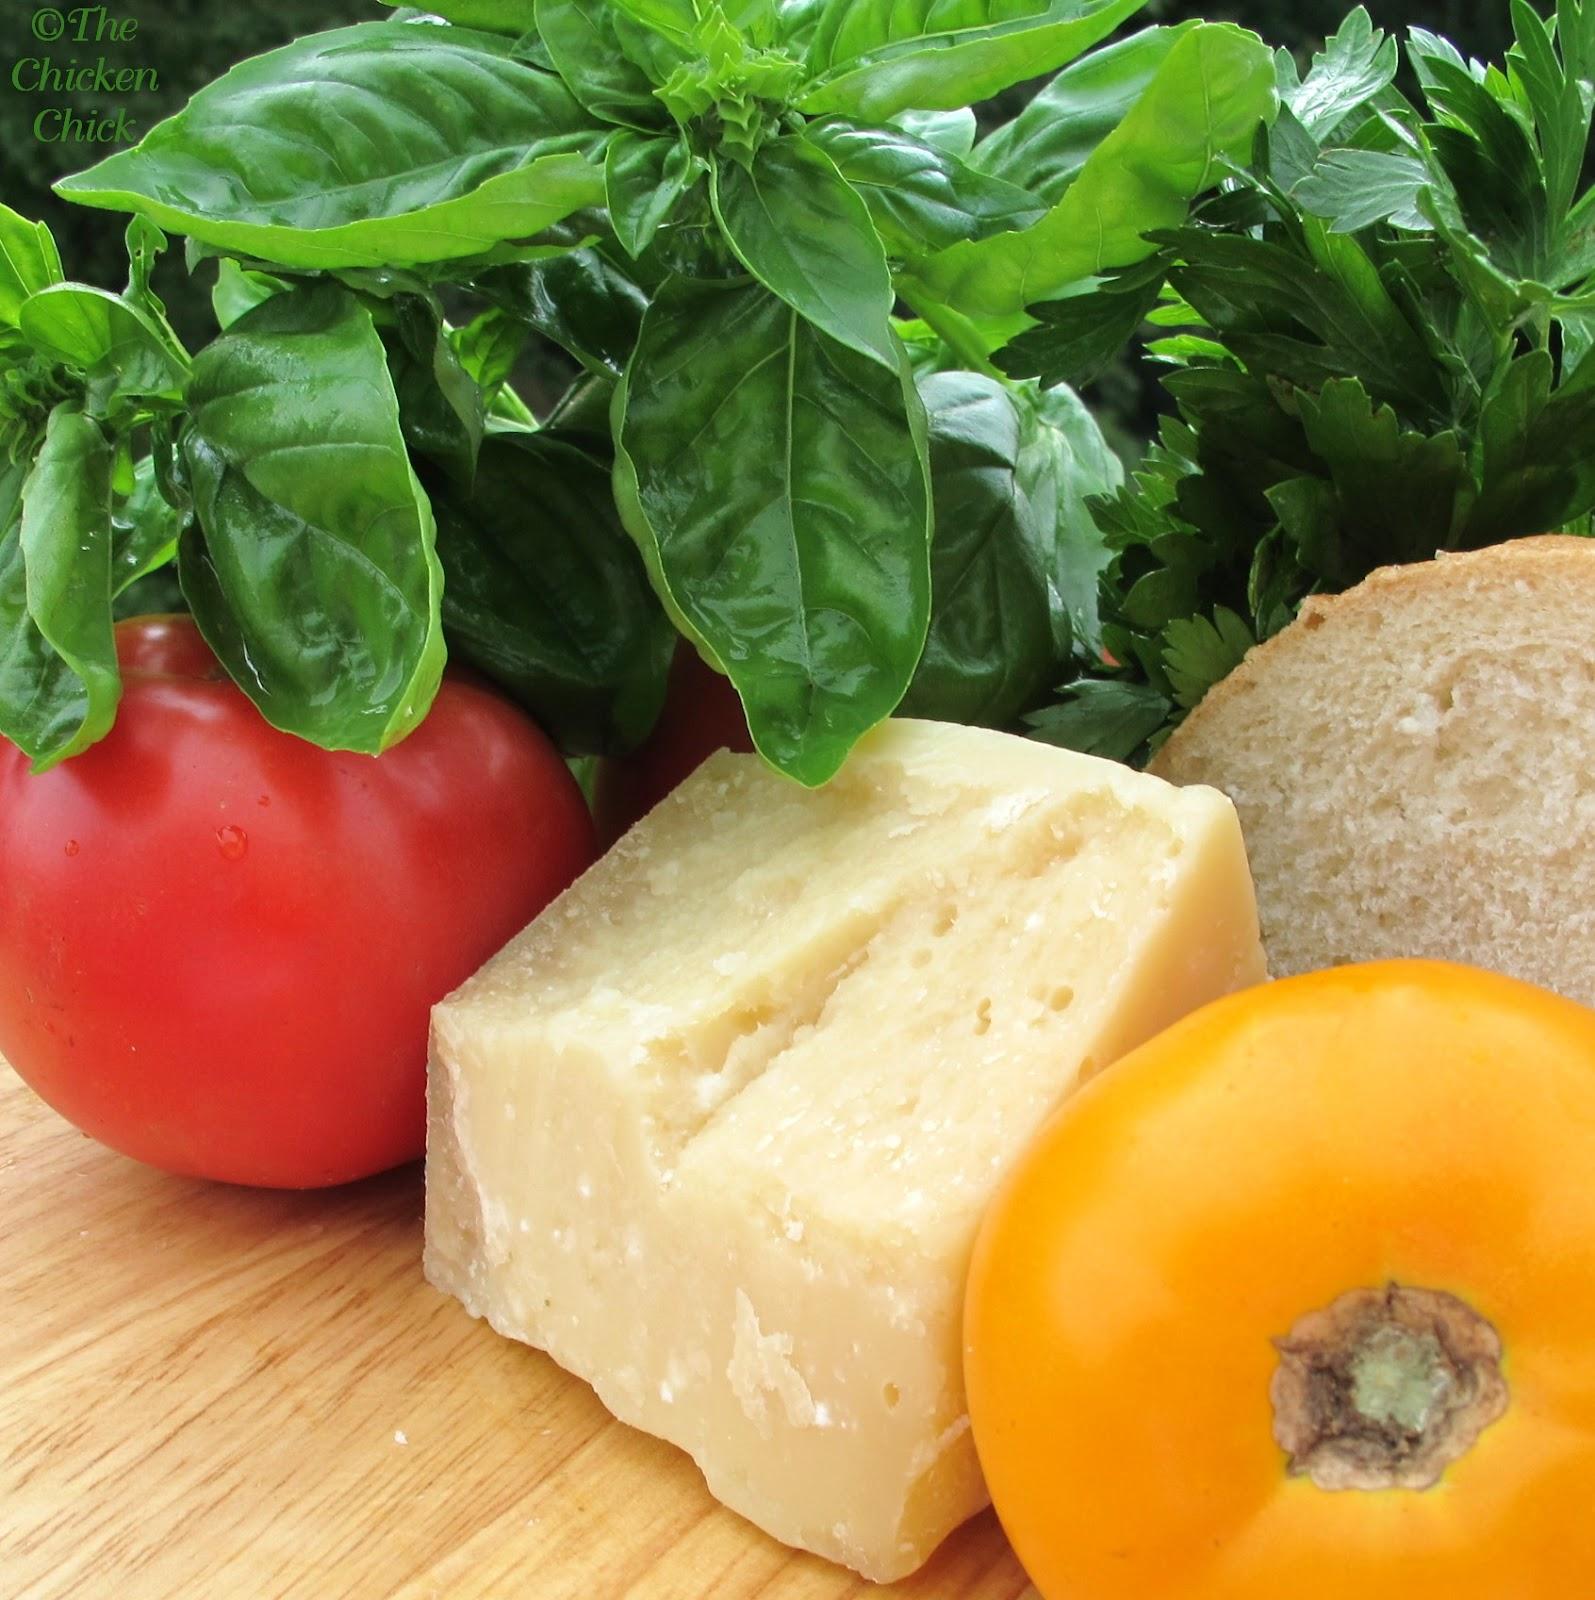 ... Chicken Chick®: Panzanella, Tomato Bread Salad. The taste of summer